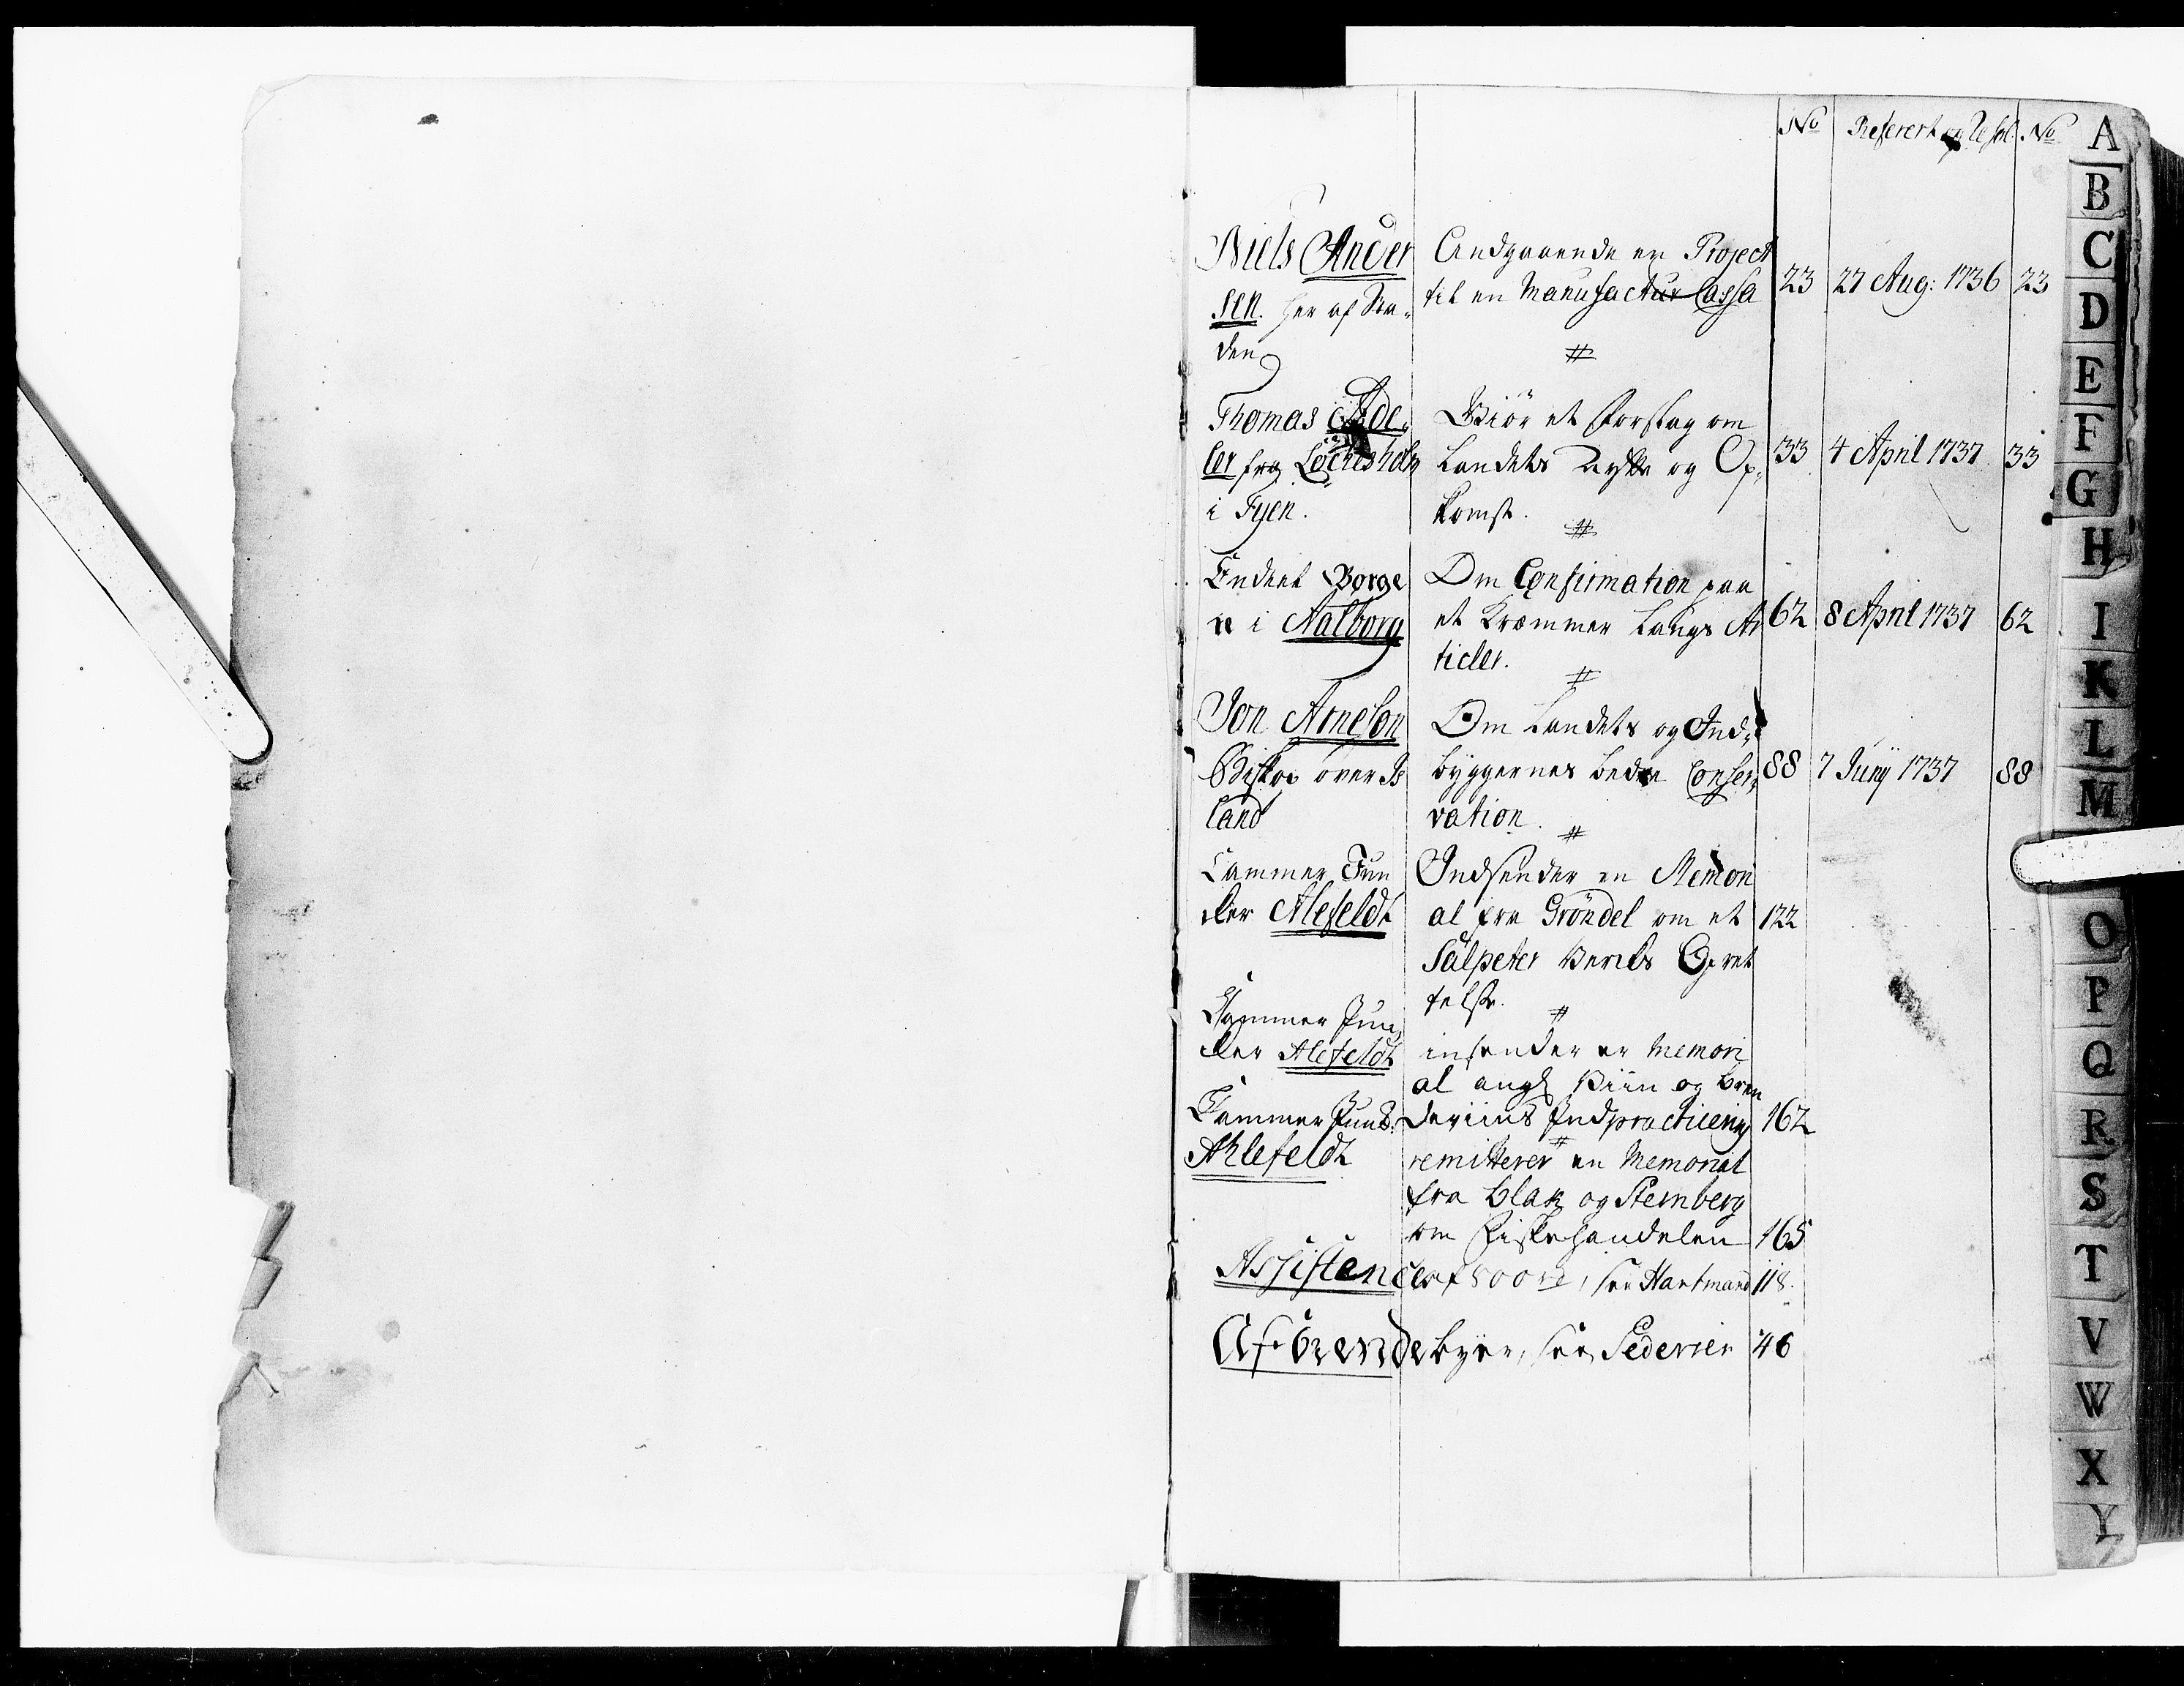 DRA, Kommercekollegiet, Dansk-Norske Sekretariat, -/37: Projekt Protokol A, 1736-1740